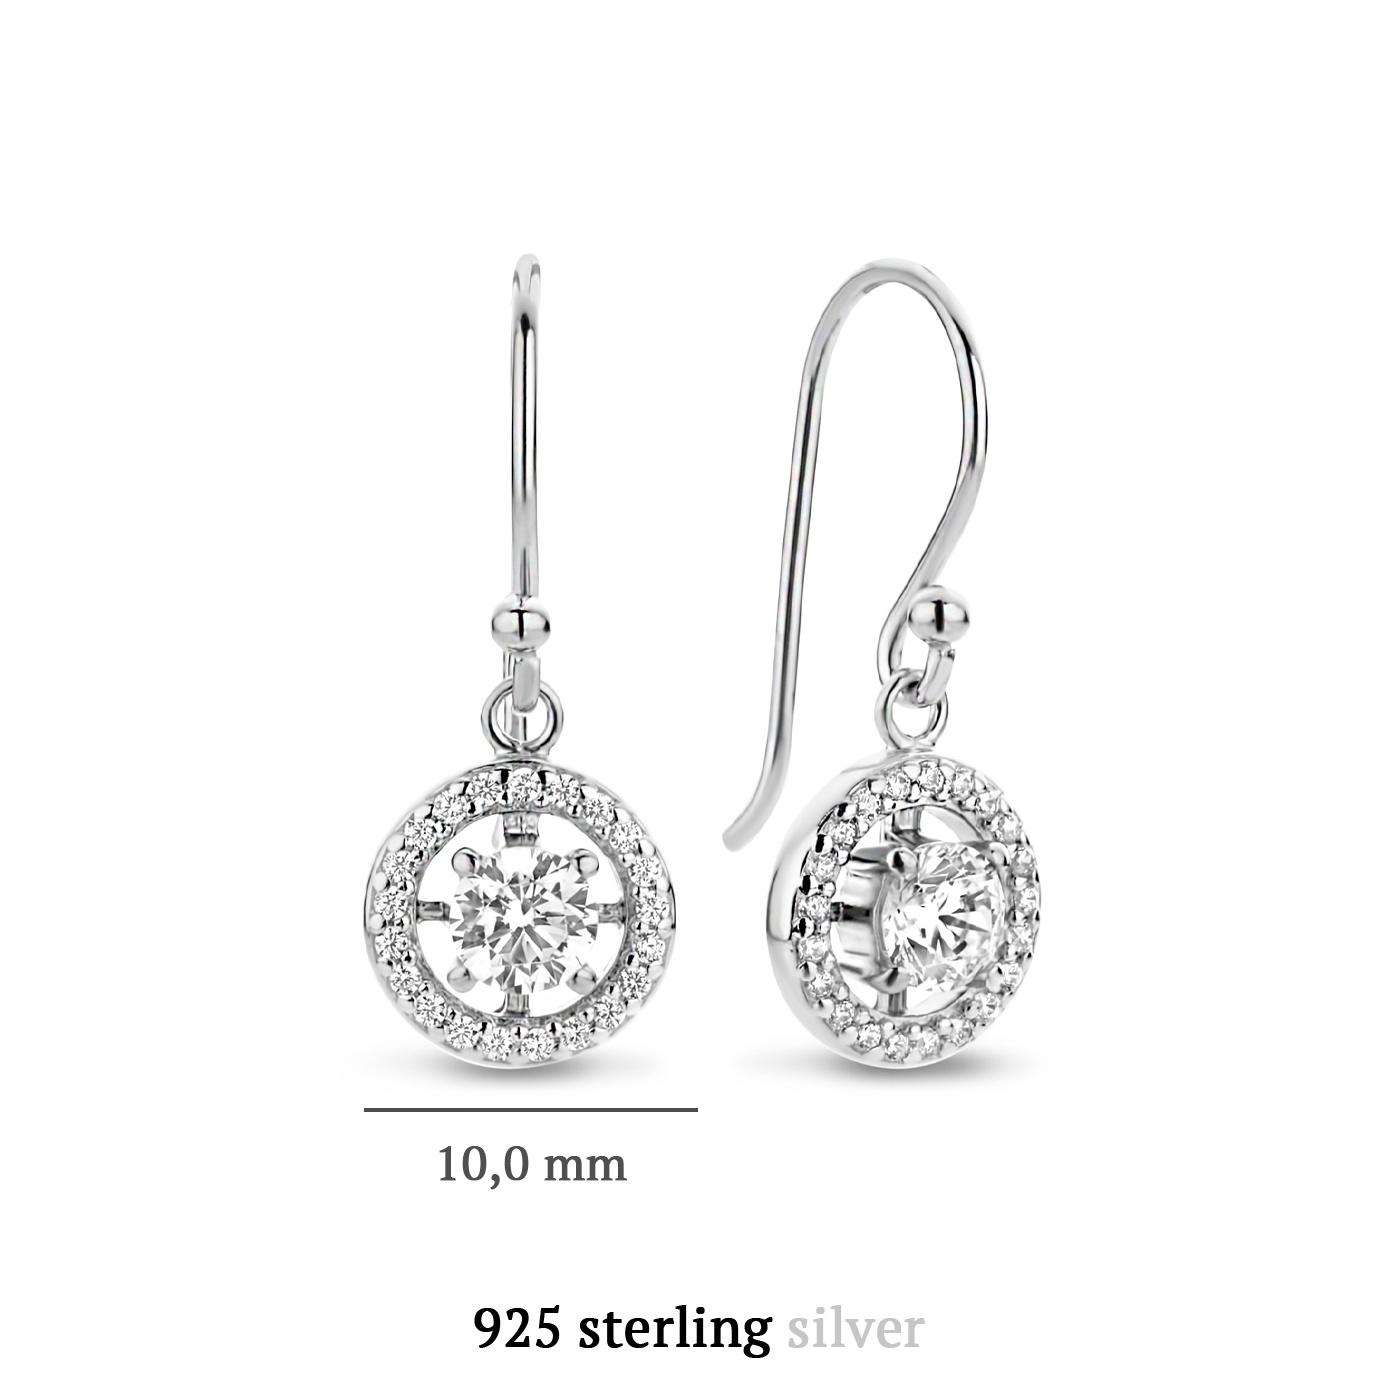 Parte di Me Luce Mia Dalia 925 sterling silver drop earrings with zirconia